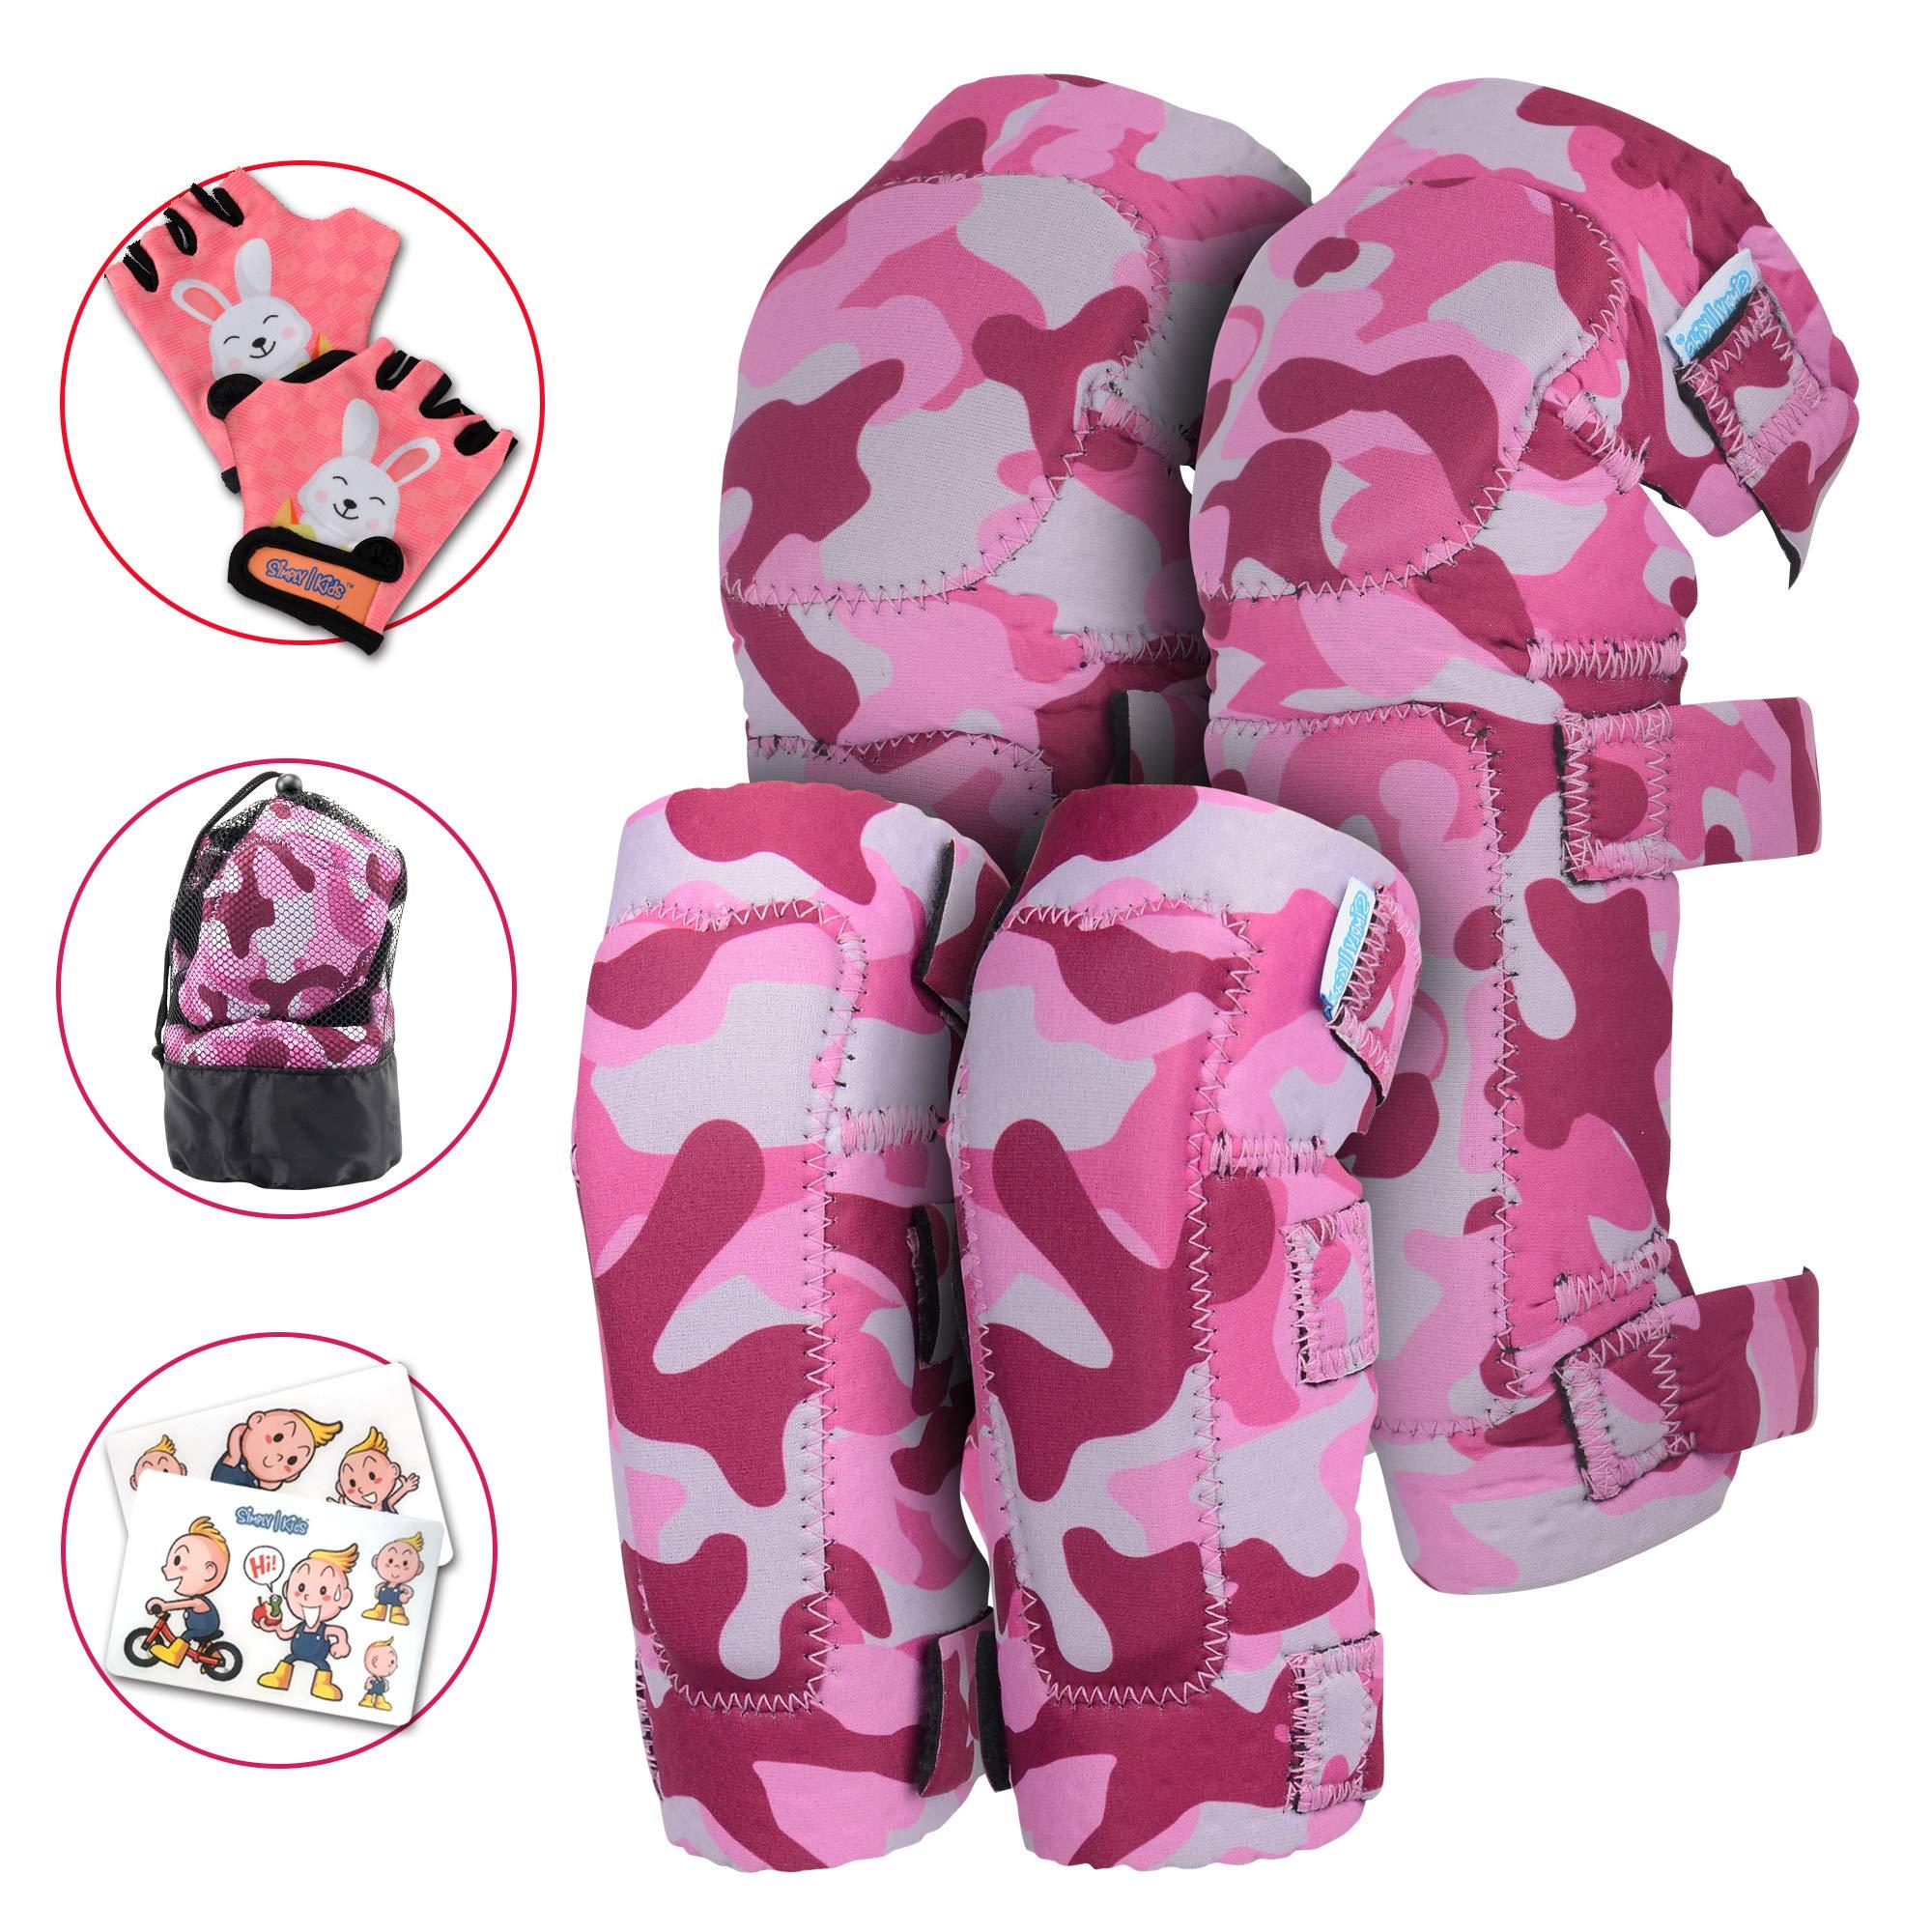 Innovative Soft Kids Knee and Elbow Pads with Bike Gloves | Toddler Protective Gear Set w/Mesh Bag& Sticker | Comfortable& Flexible | Roller-Skating, Skateboard, Bike Knee Pads for Children Boys Girls